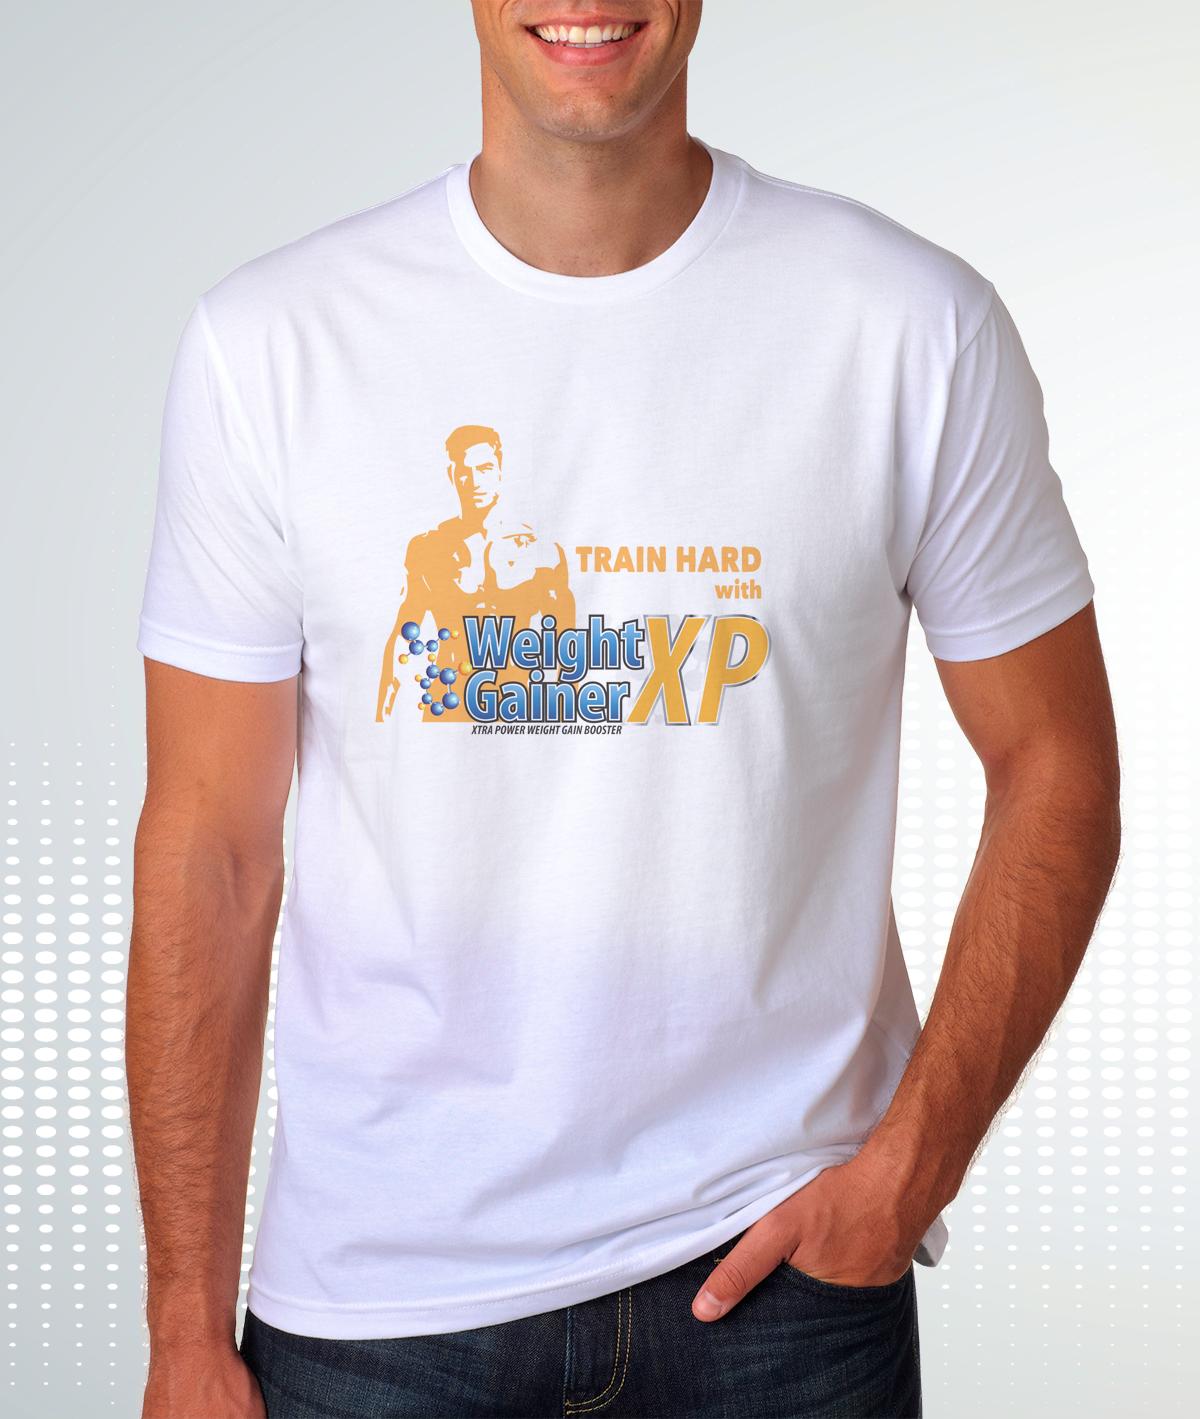 Masculine bold t shirt design for matthew taylor by pablo for Matt taylor shirt buy